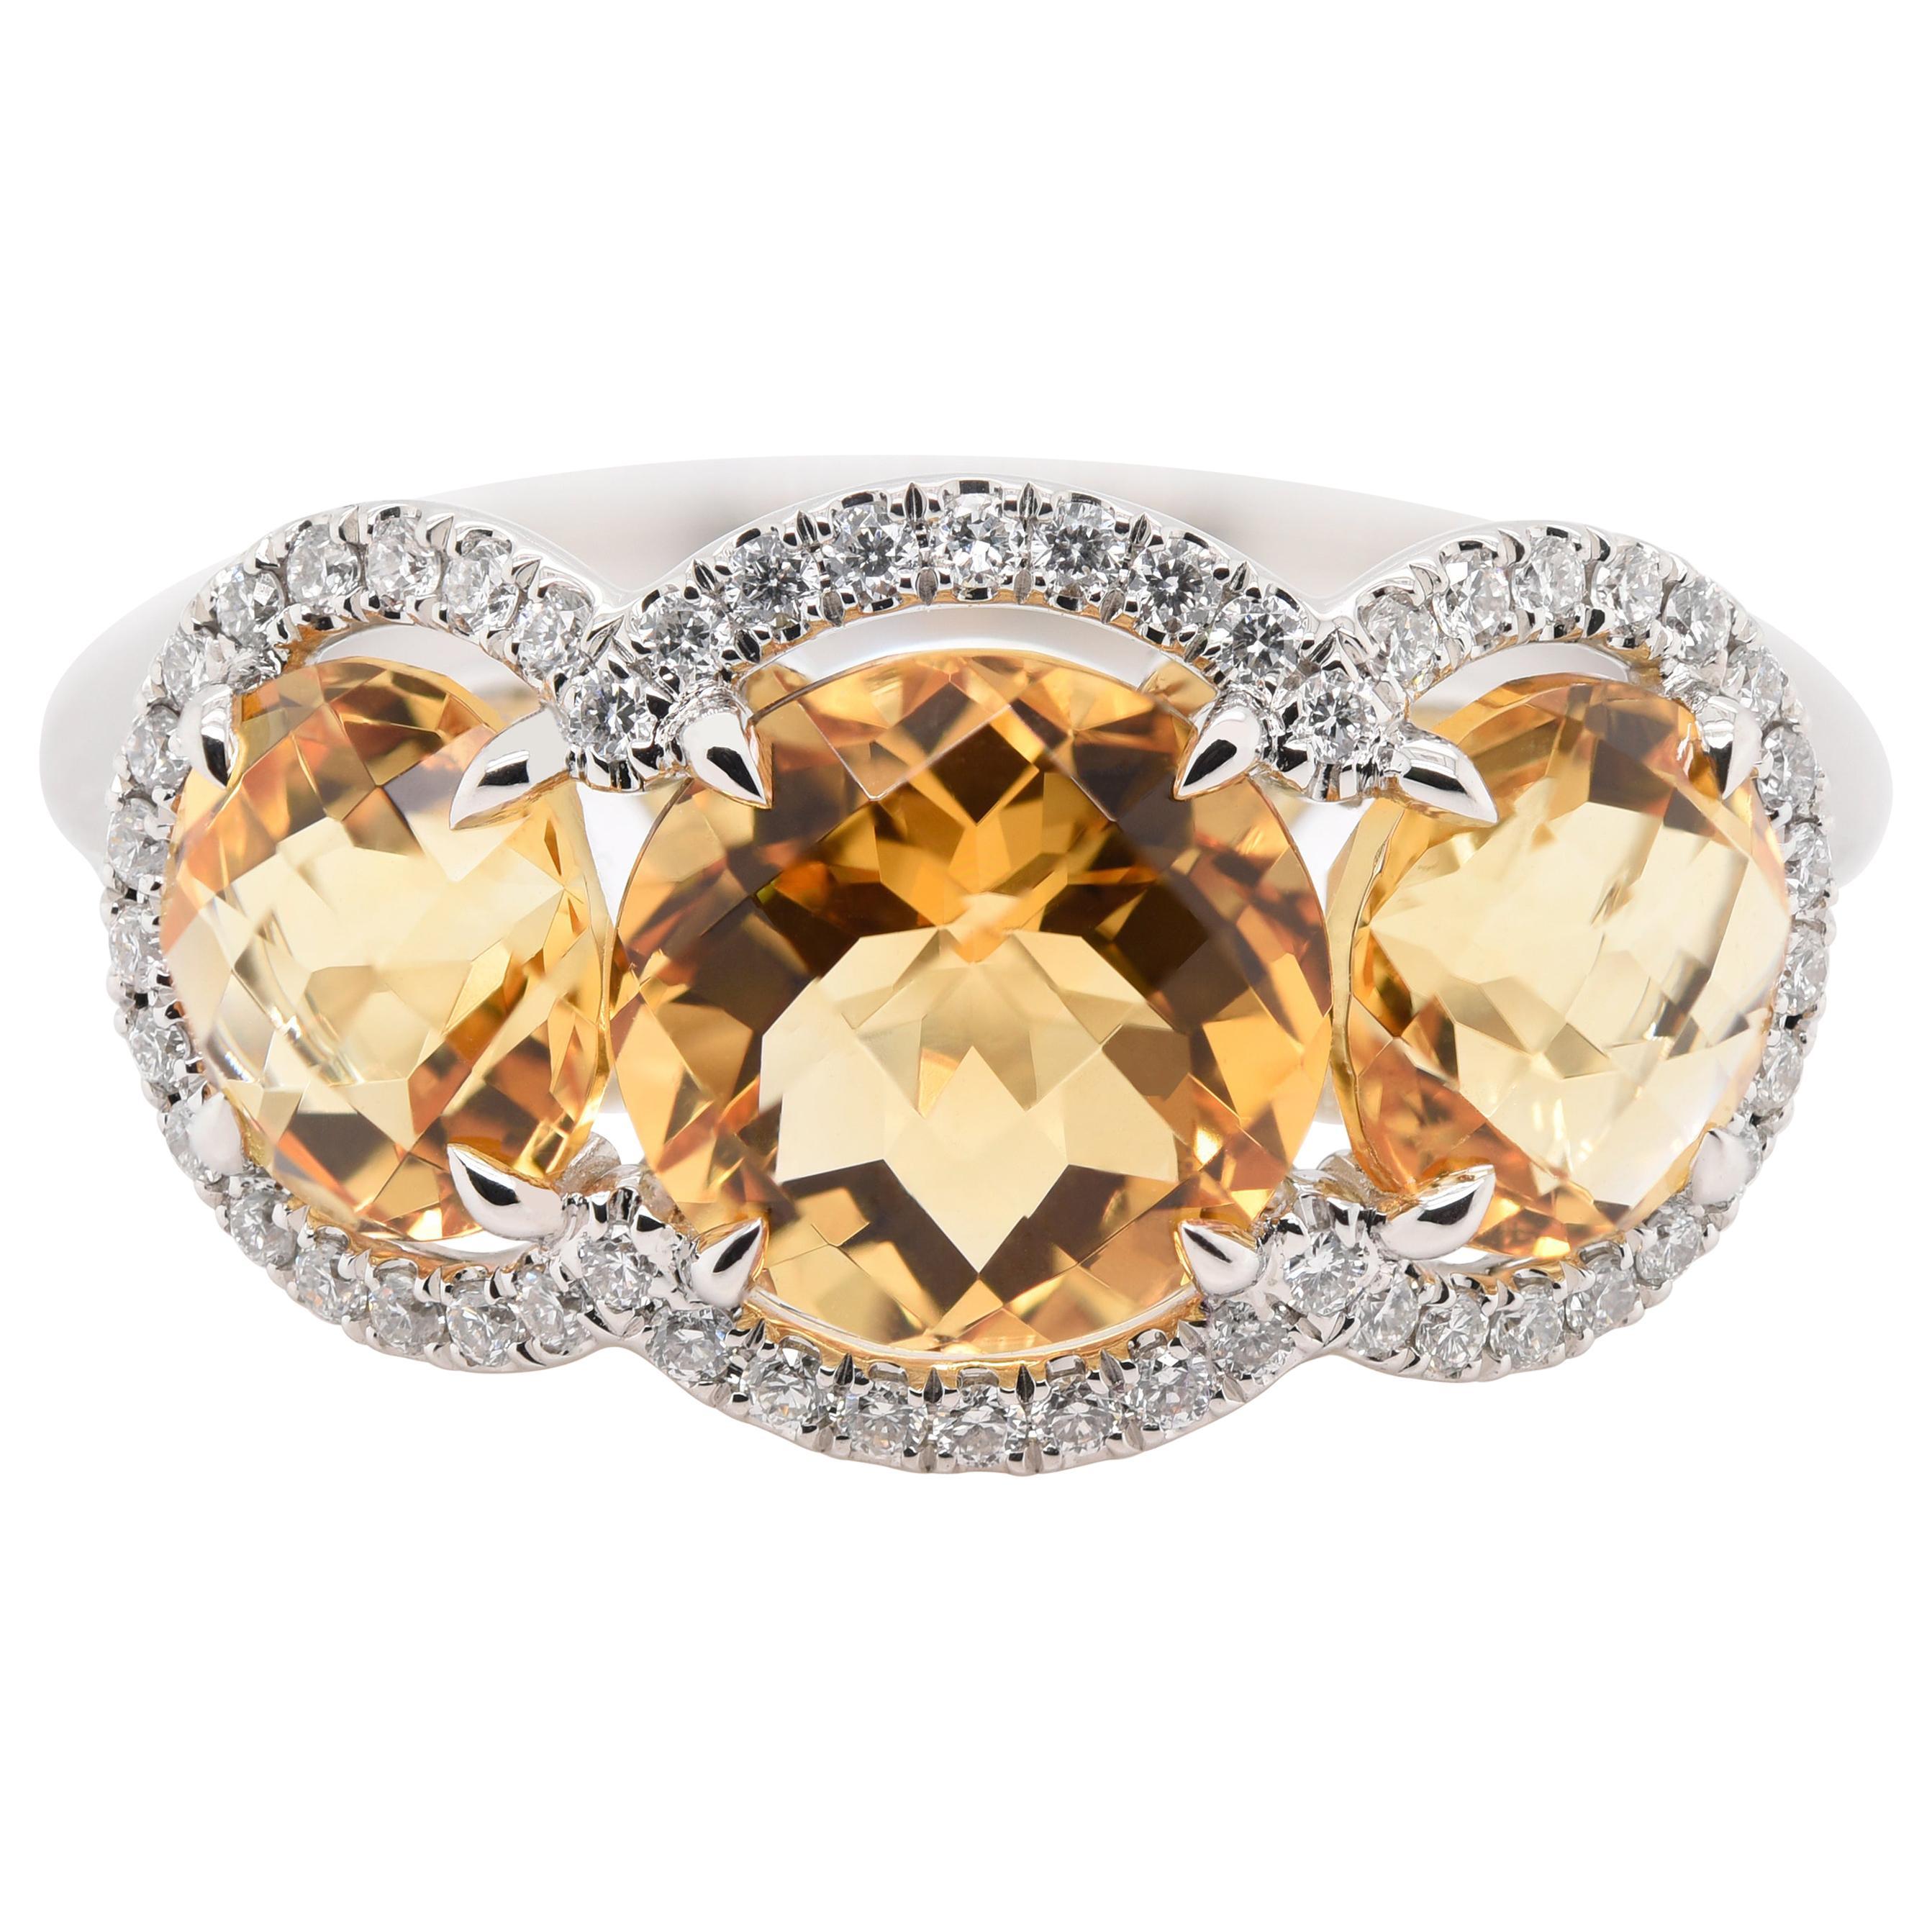 JAG New York Three Citrine Surrounded by Diamond Halos Ring in Platinum